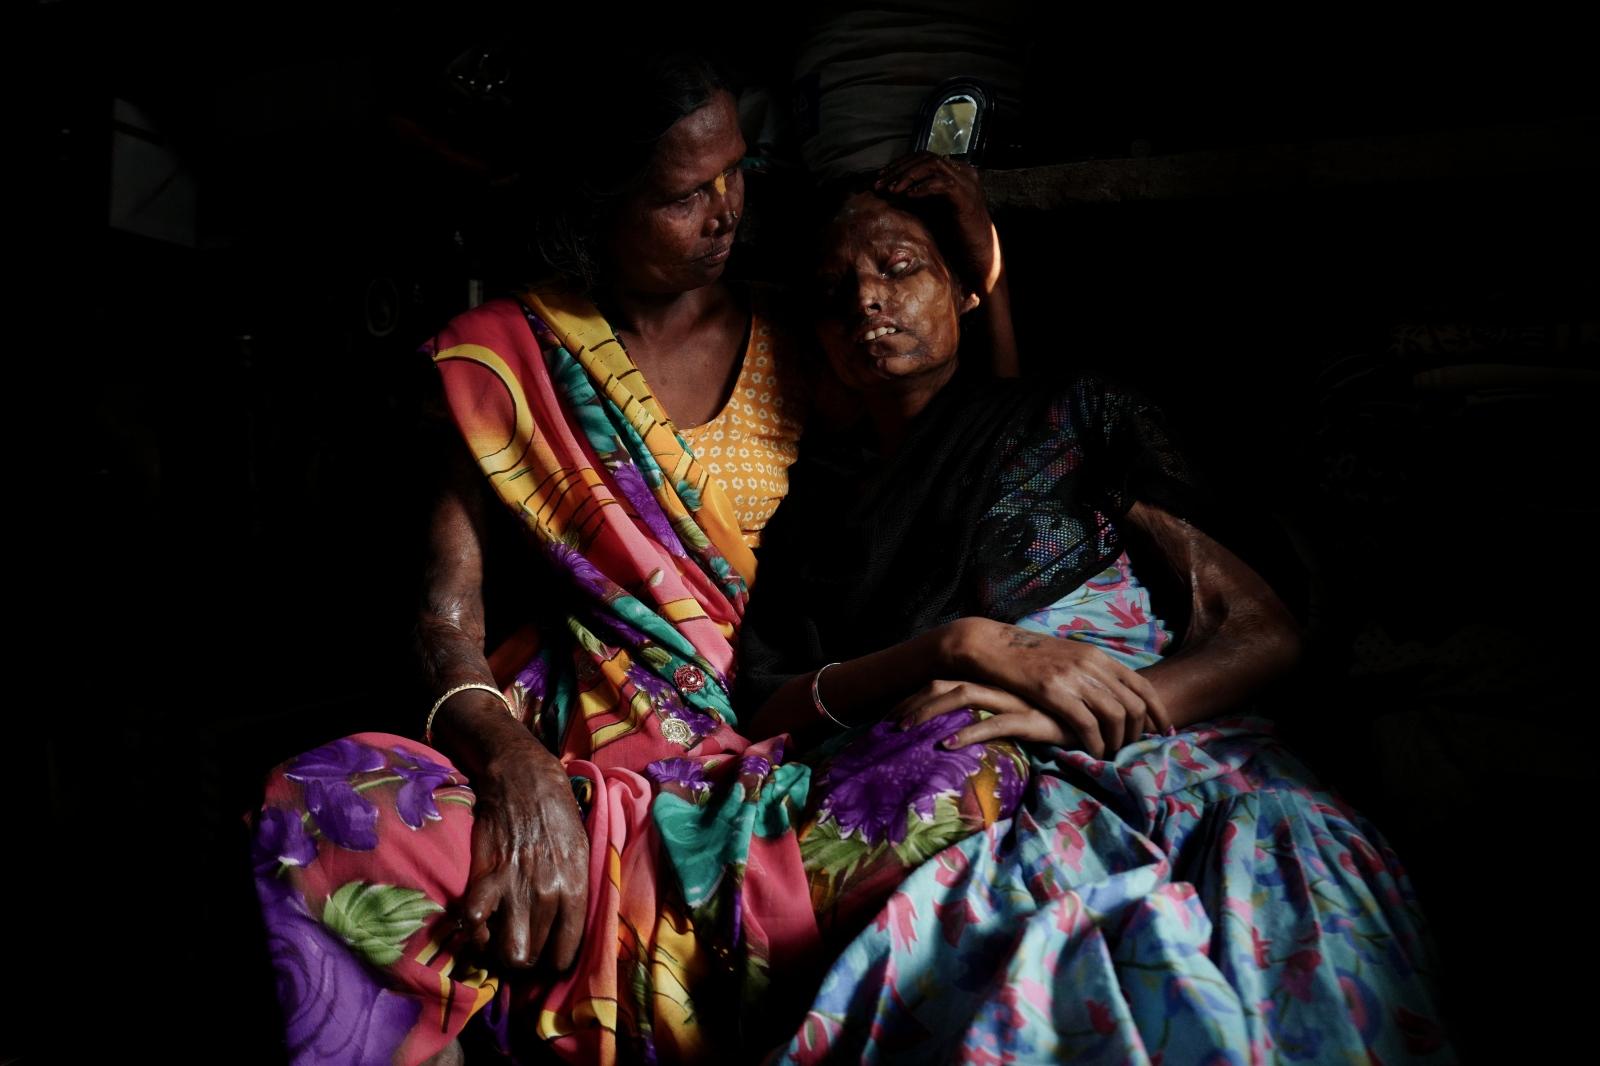 Agra,India, 04 November 2015. Geeta caressing her blind daughter Neetu, both victims of husband's acid attack.